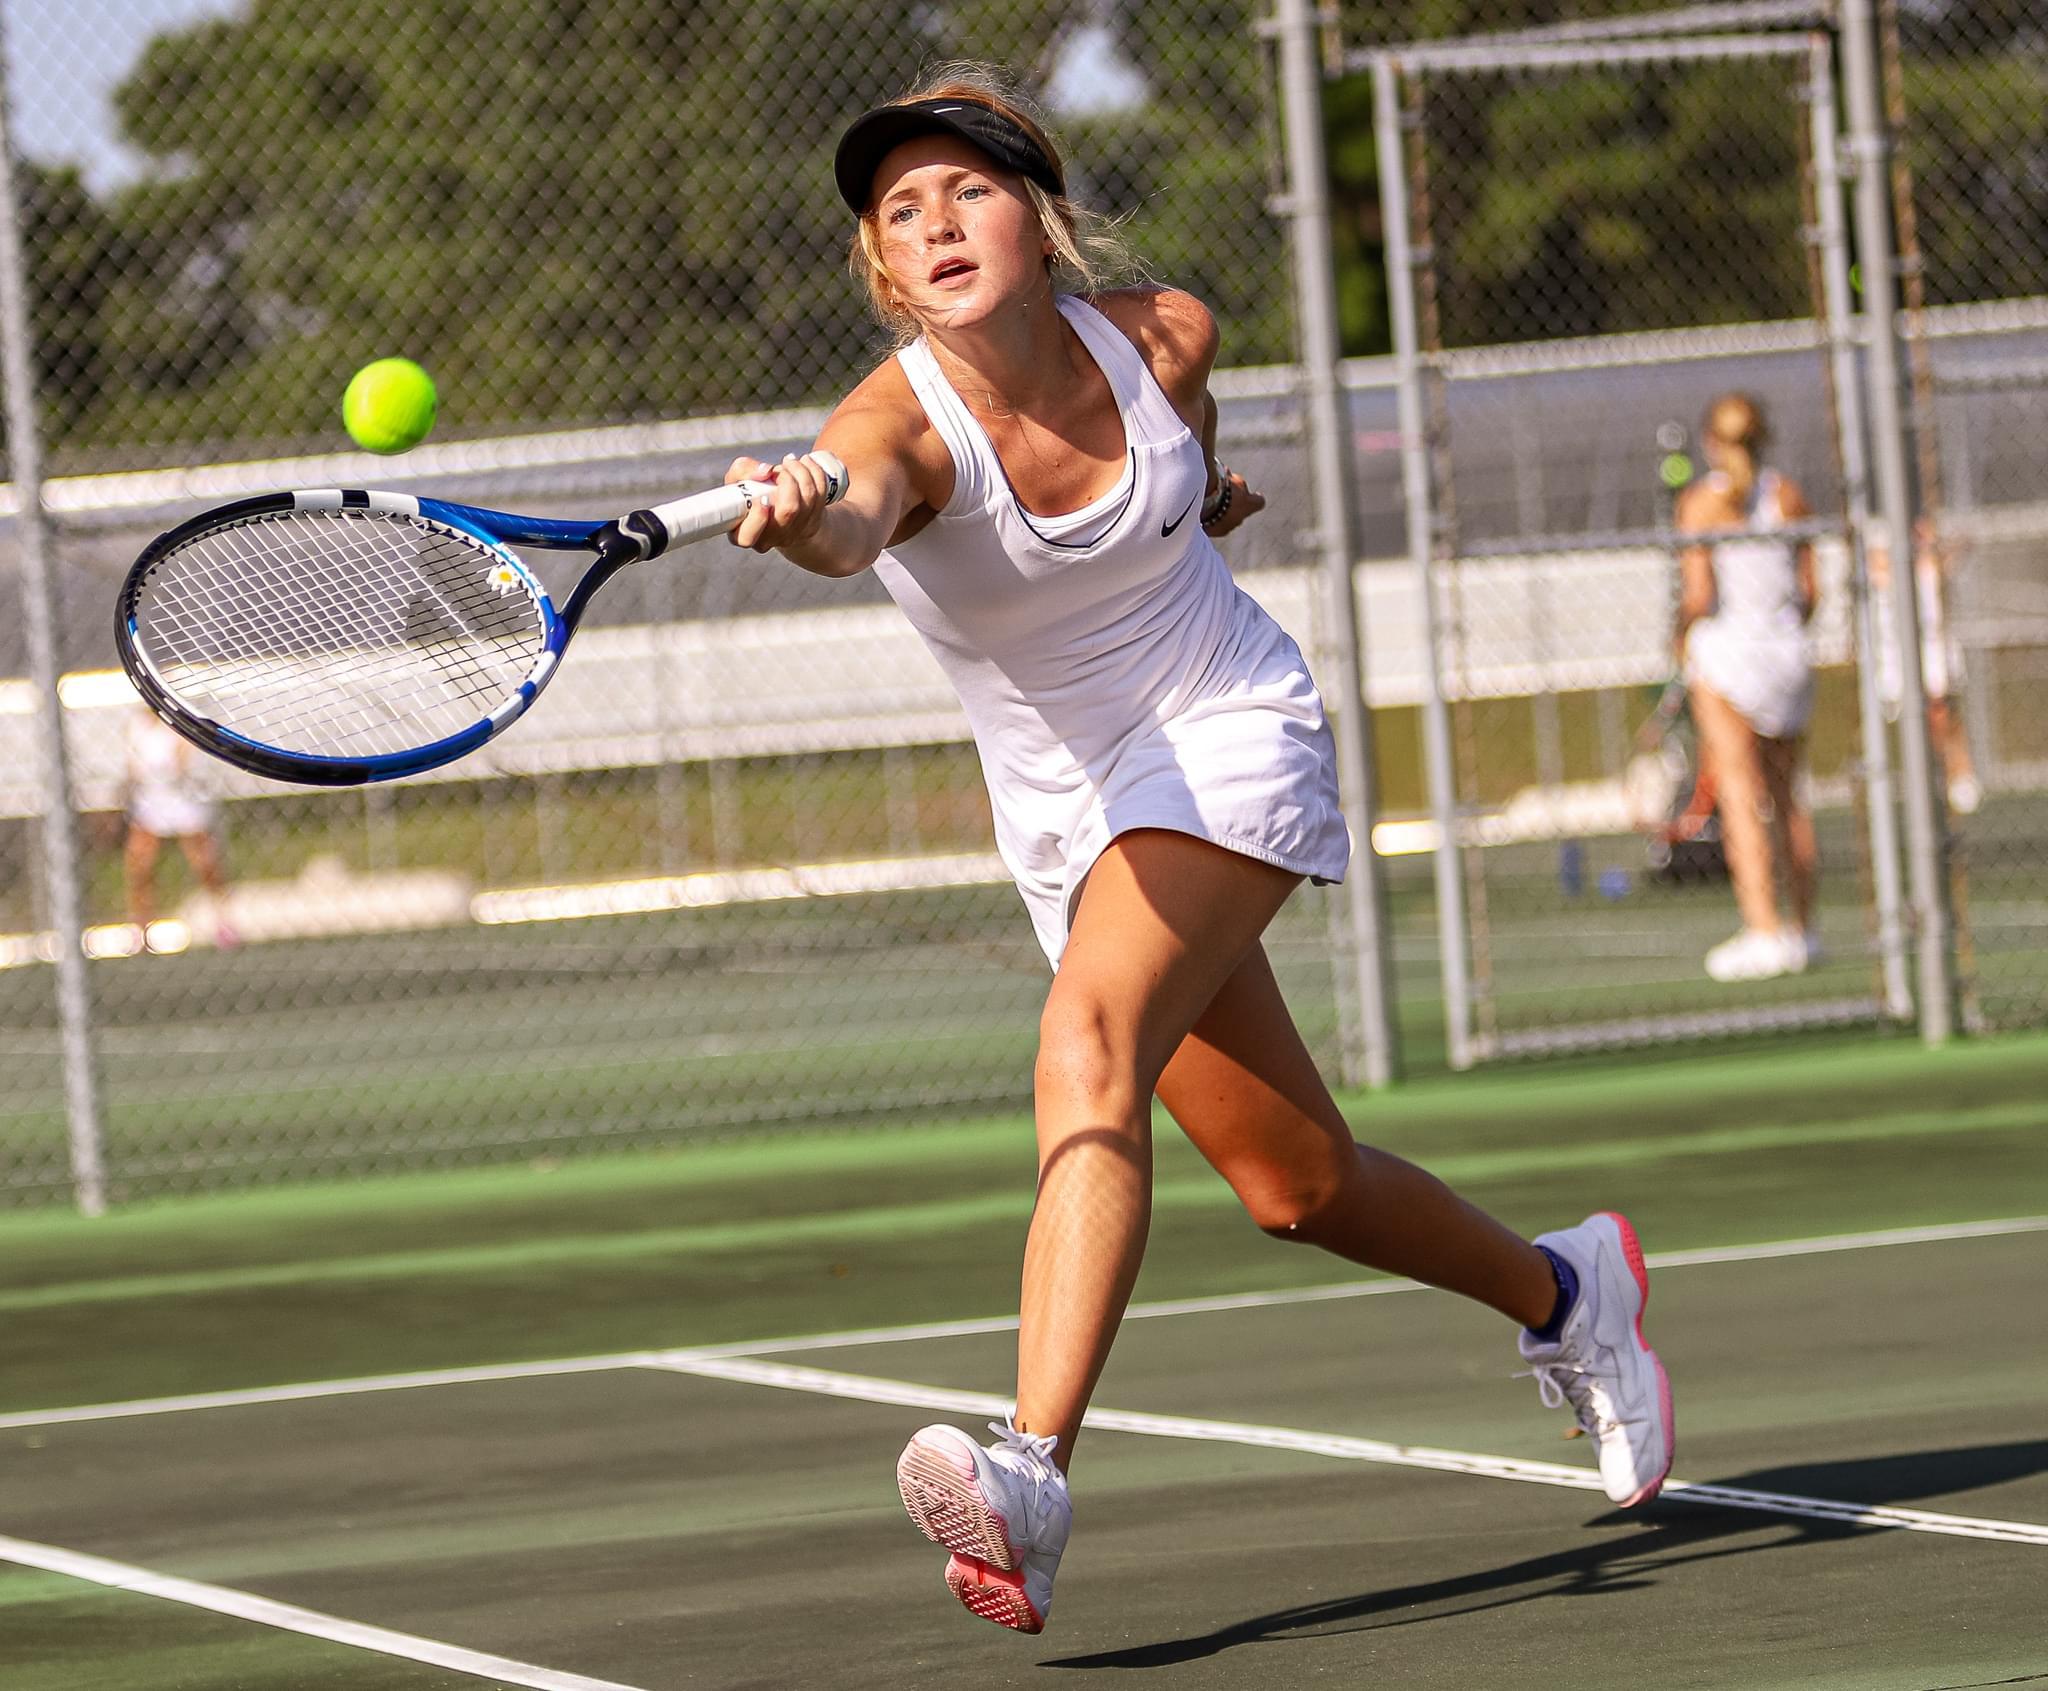 Wayne Country Day Girls' Tennis Team Opens Its Season (PHOTO GALLERY)